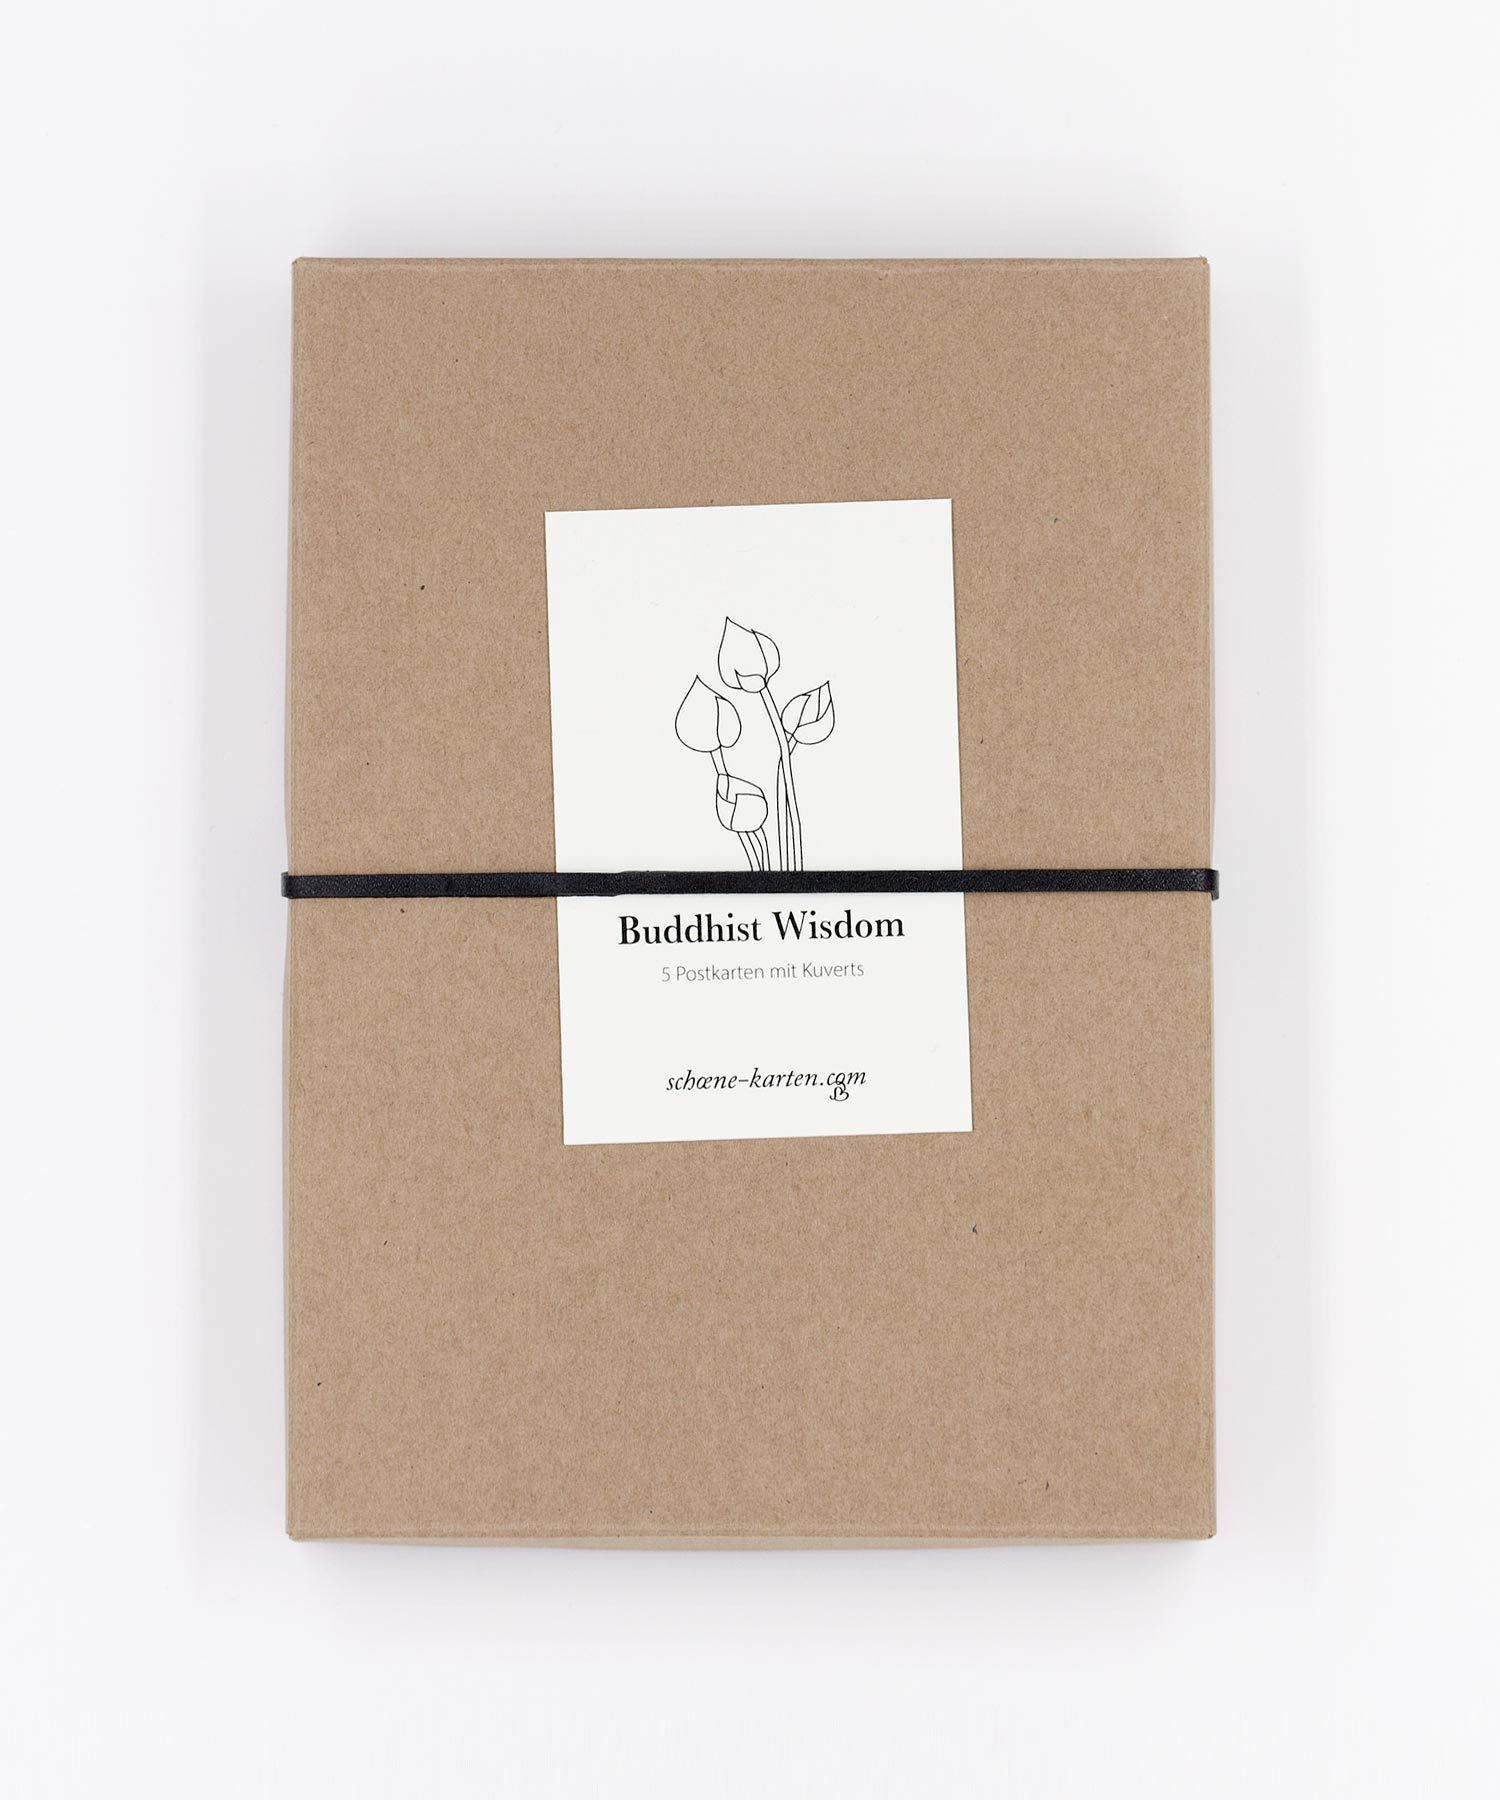 Buddhist Wisdom Postkarten Box